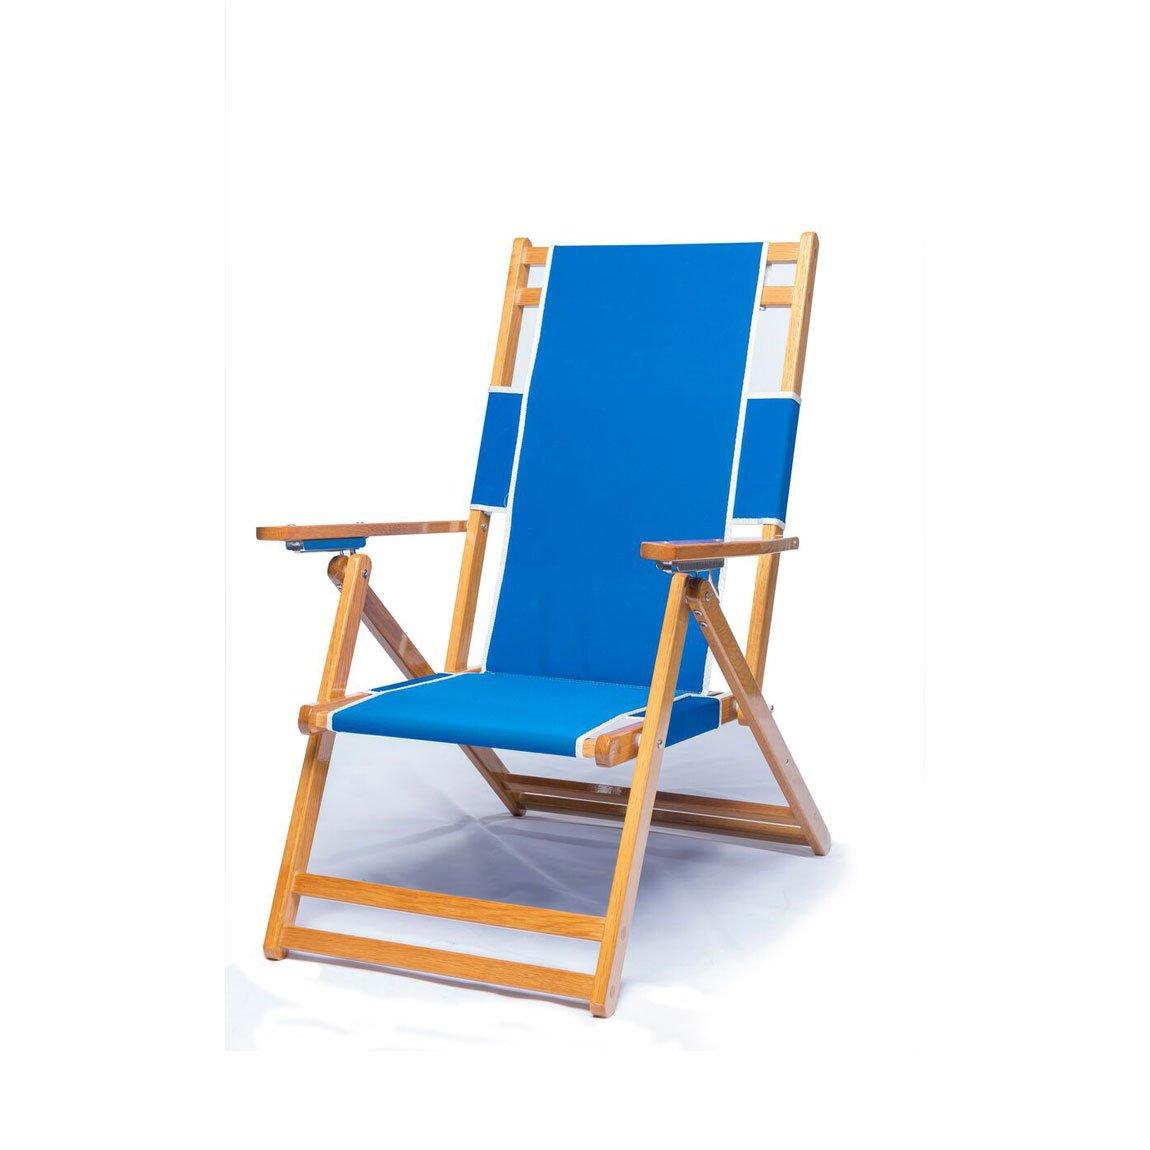 Heavy Duty商用グレードオークウッドビーチ椅子/ Chaise Lounger B01NBFYE0X  ブルー(Pacific Blue) Add Drink Holder / No Foot Rest